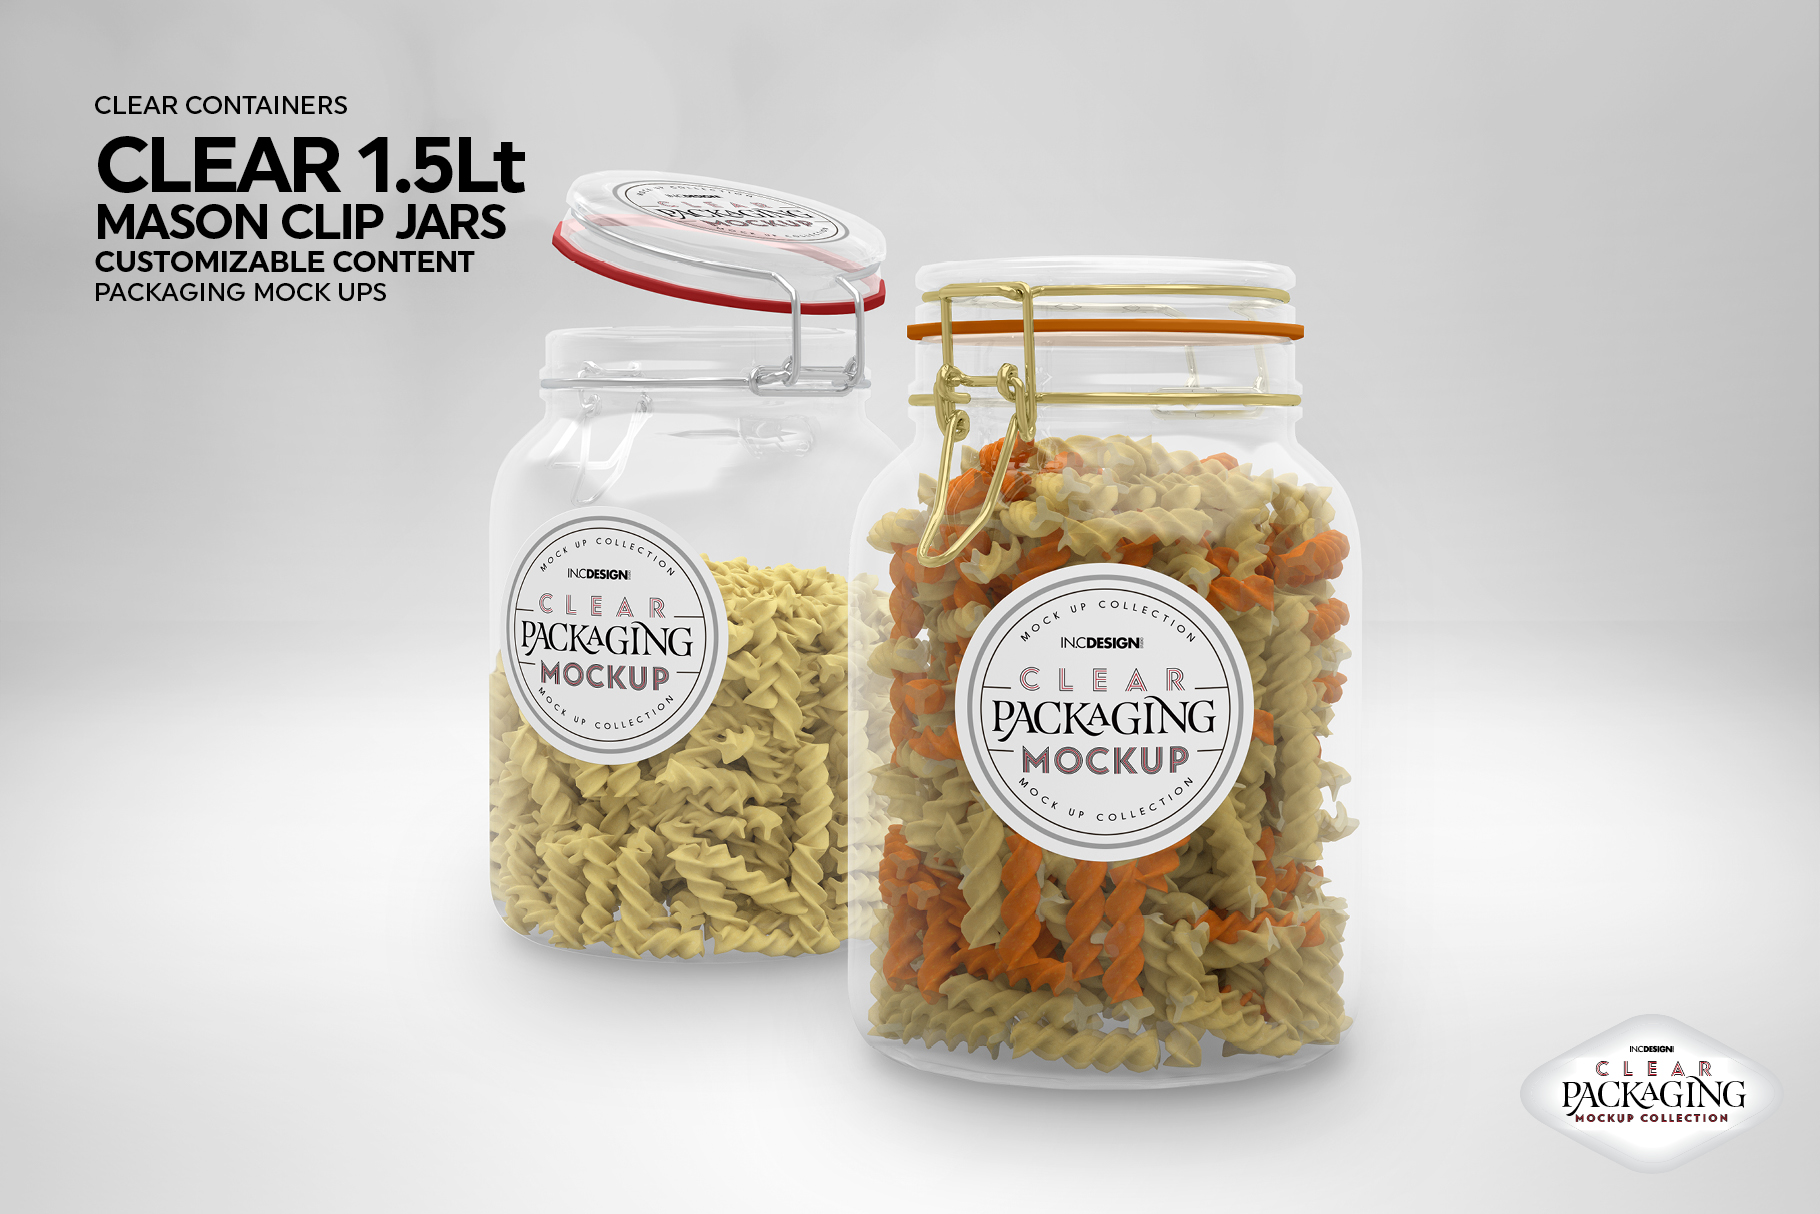 Clear 1.5 Liter Mason Clip Jar Packaging Mockup example image 7